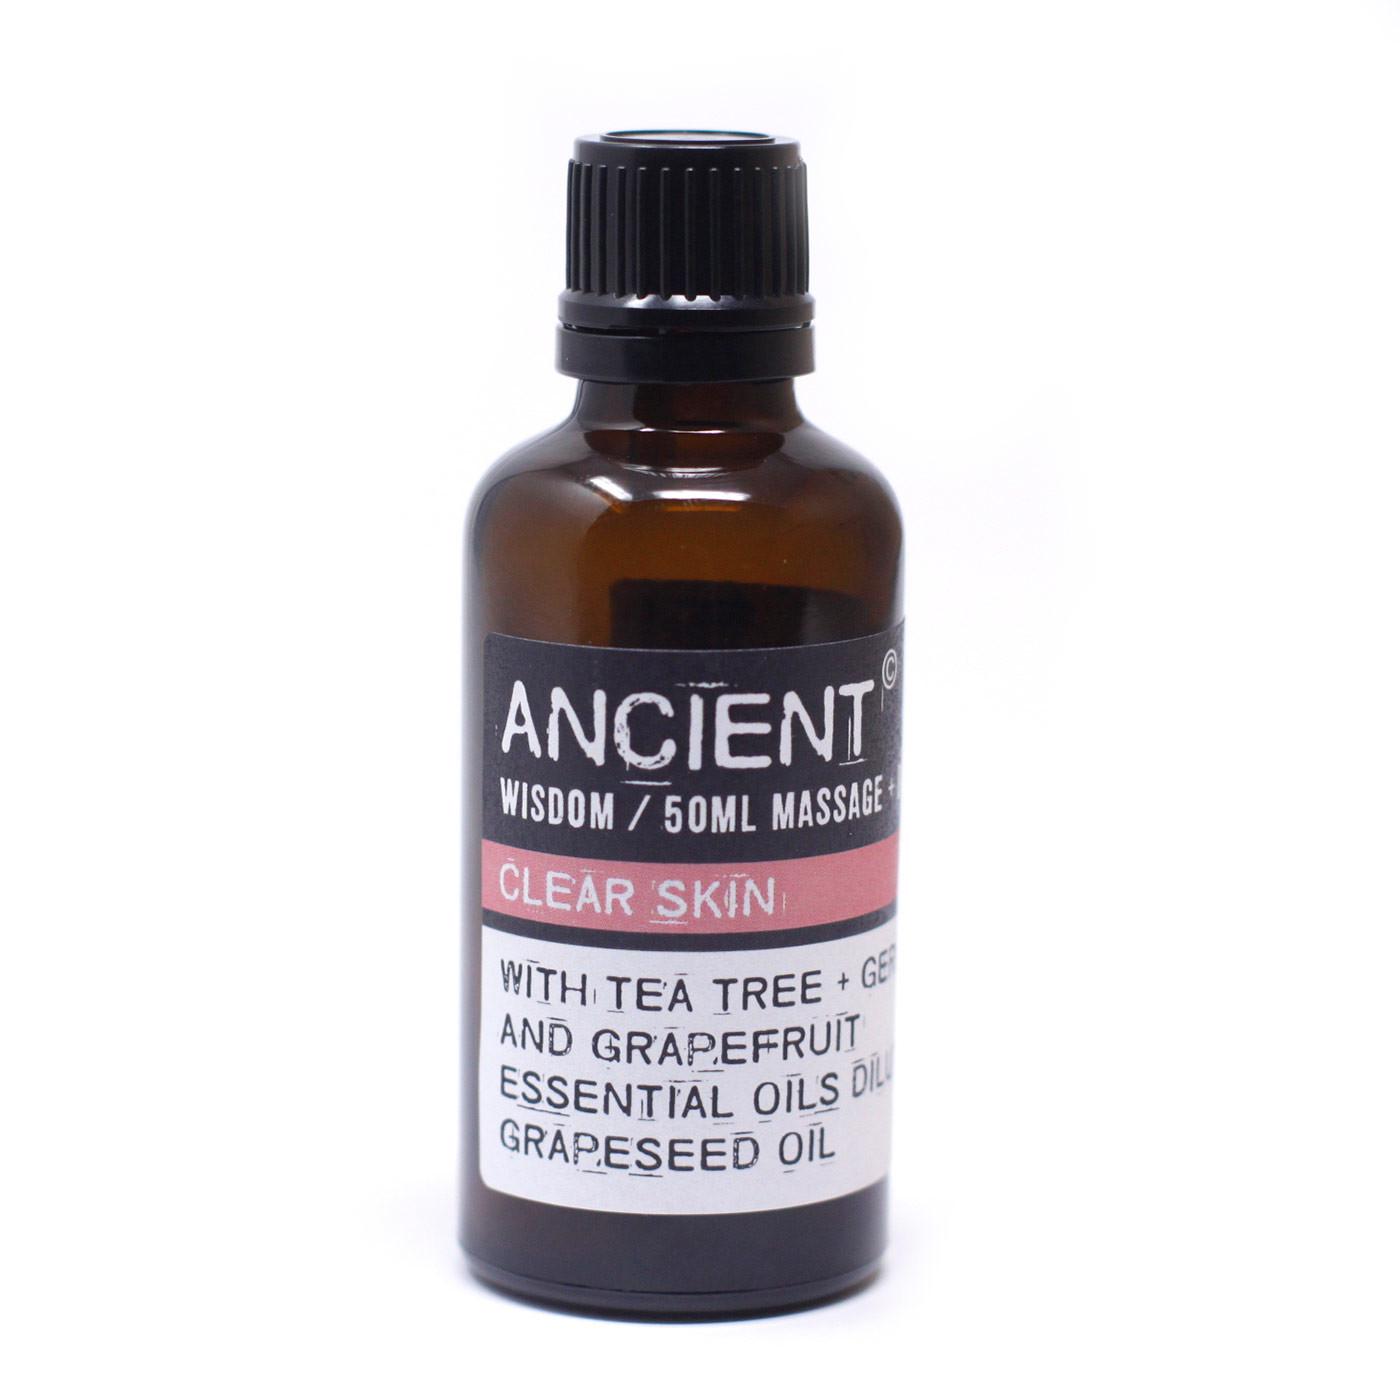 Clear Skin Massage Oil 50ml